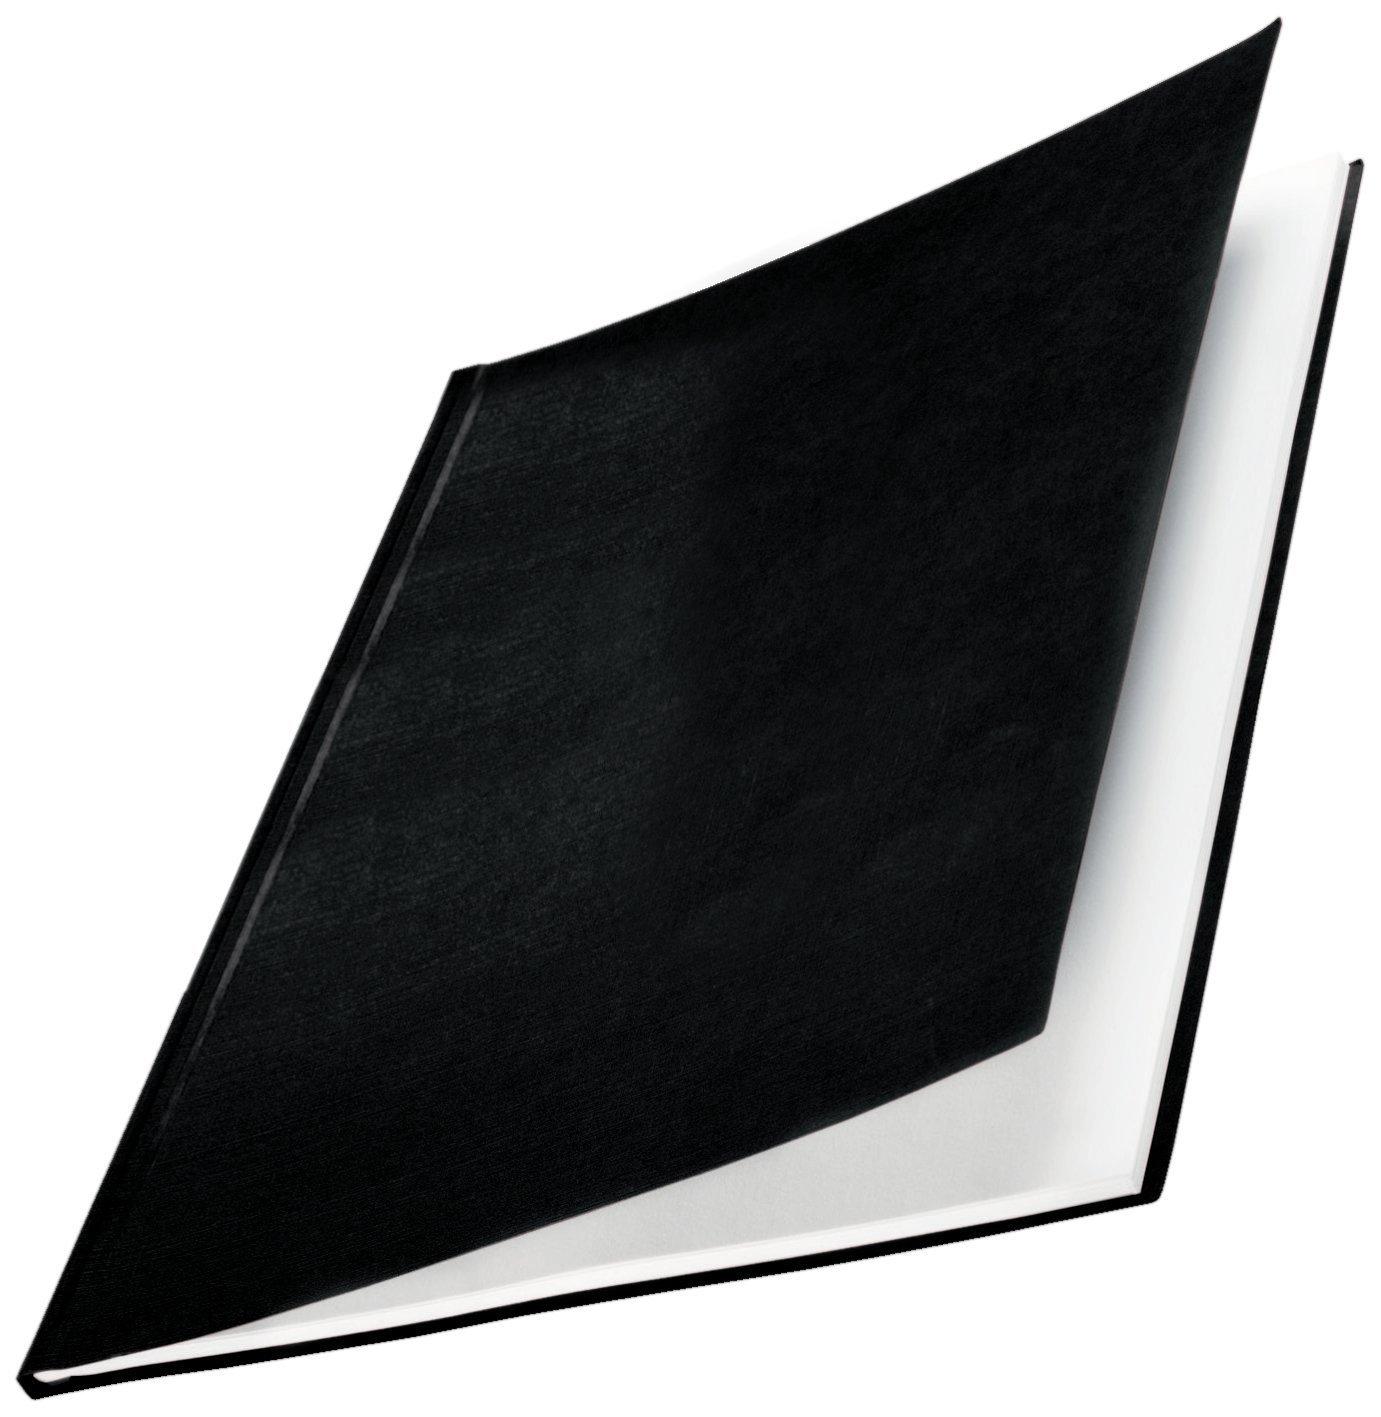 Leitz, 73930001, Copertine rigide, ImpressBind, Dorso da 14 mm, Confezione da 10 pezzi, Superficie in lino, Bianco